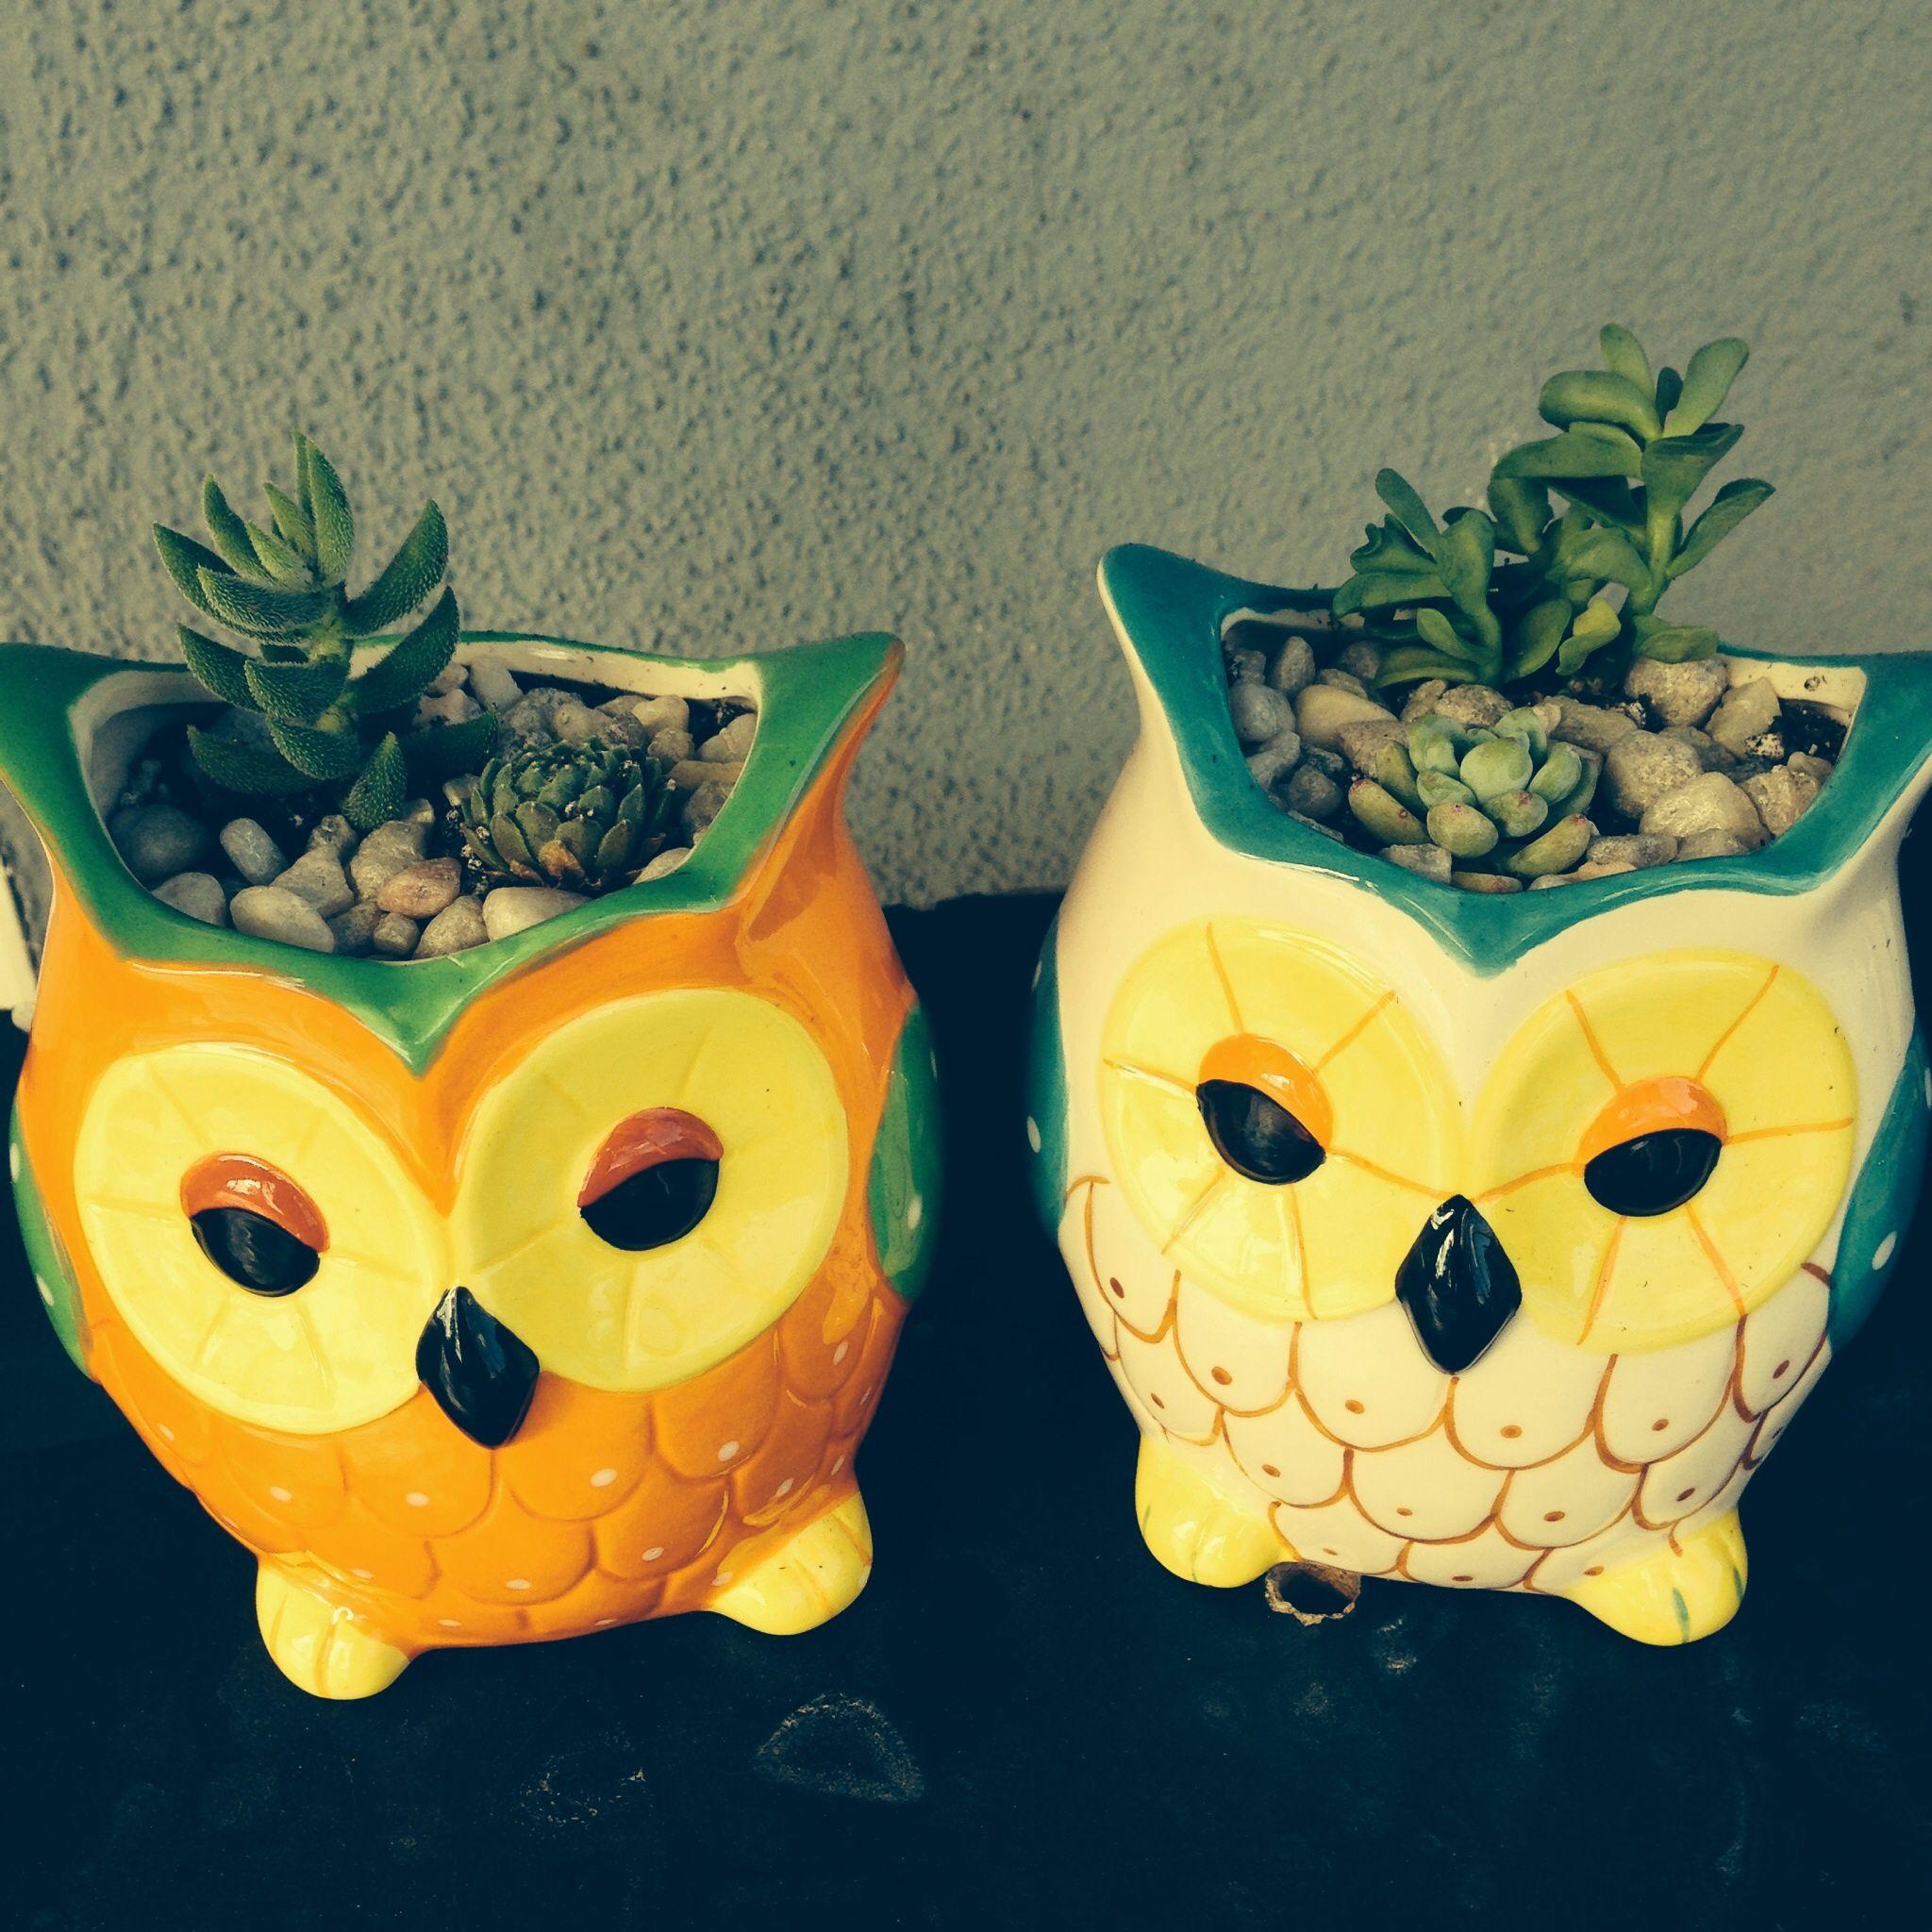 Owl plant pots fr daiso.